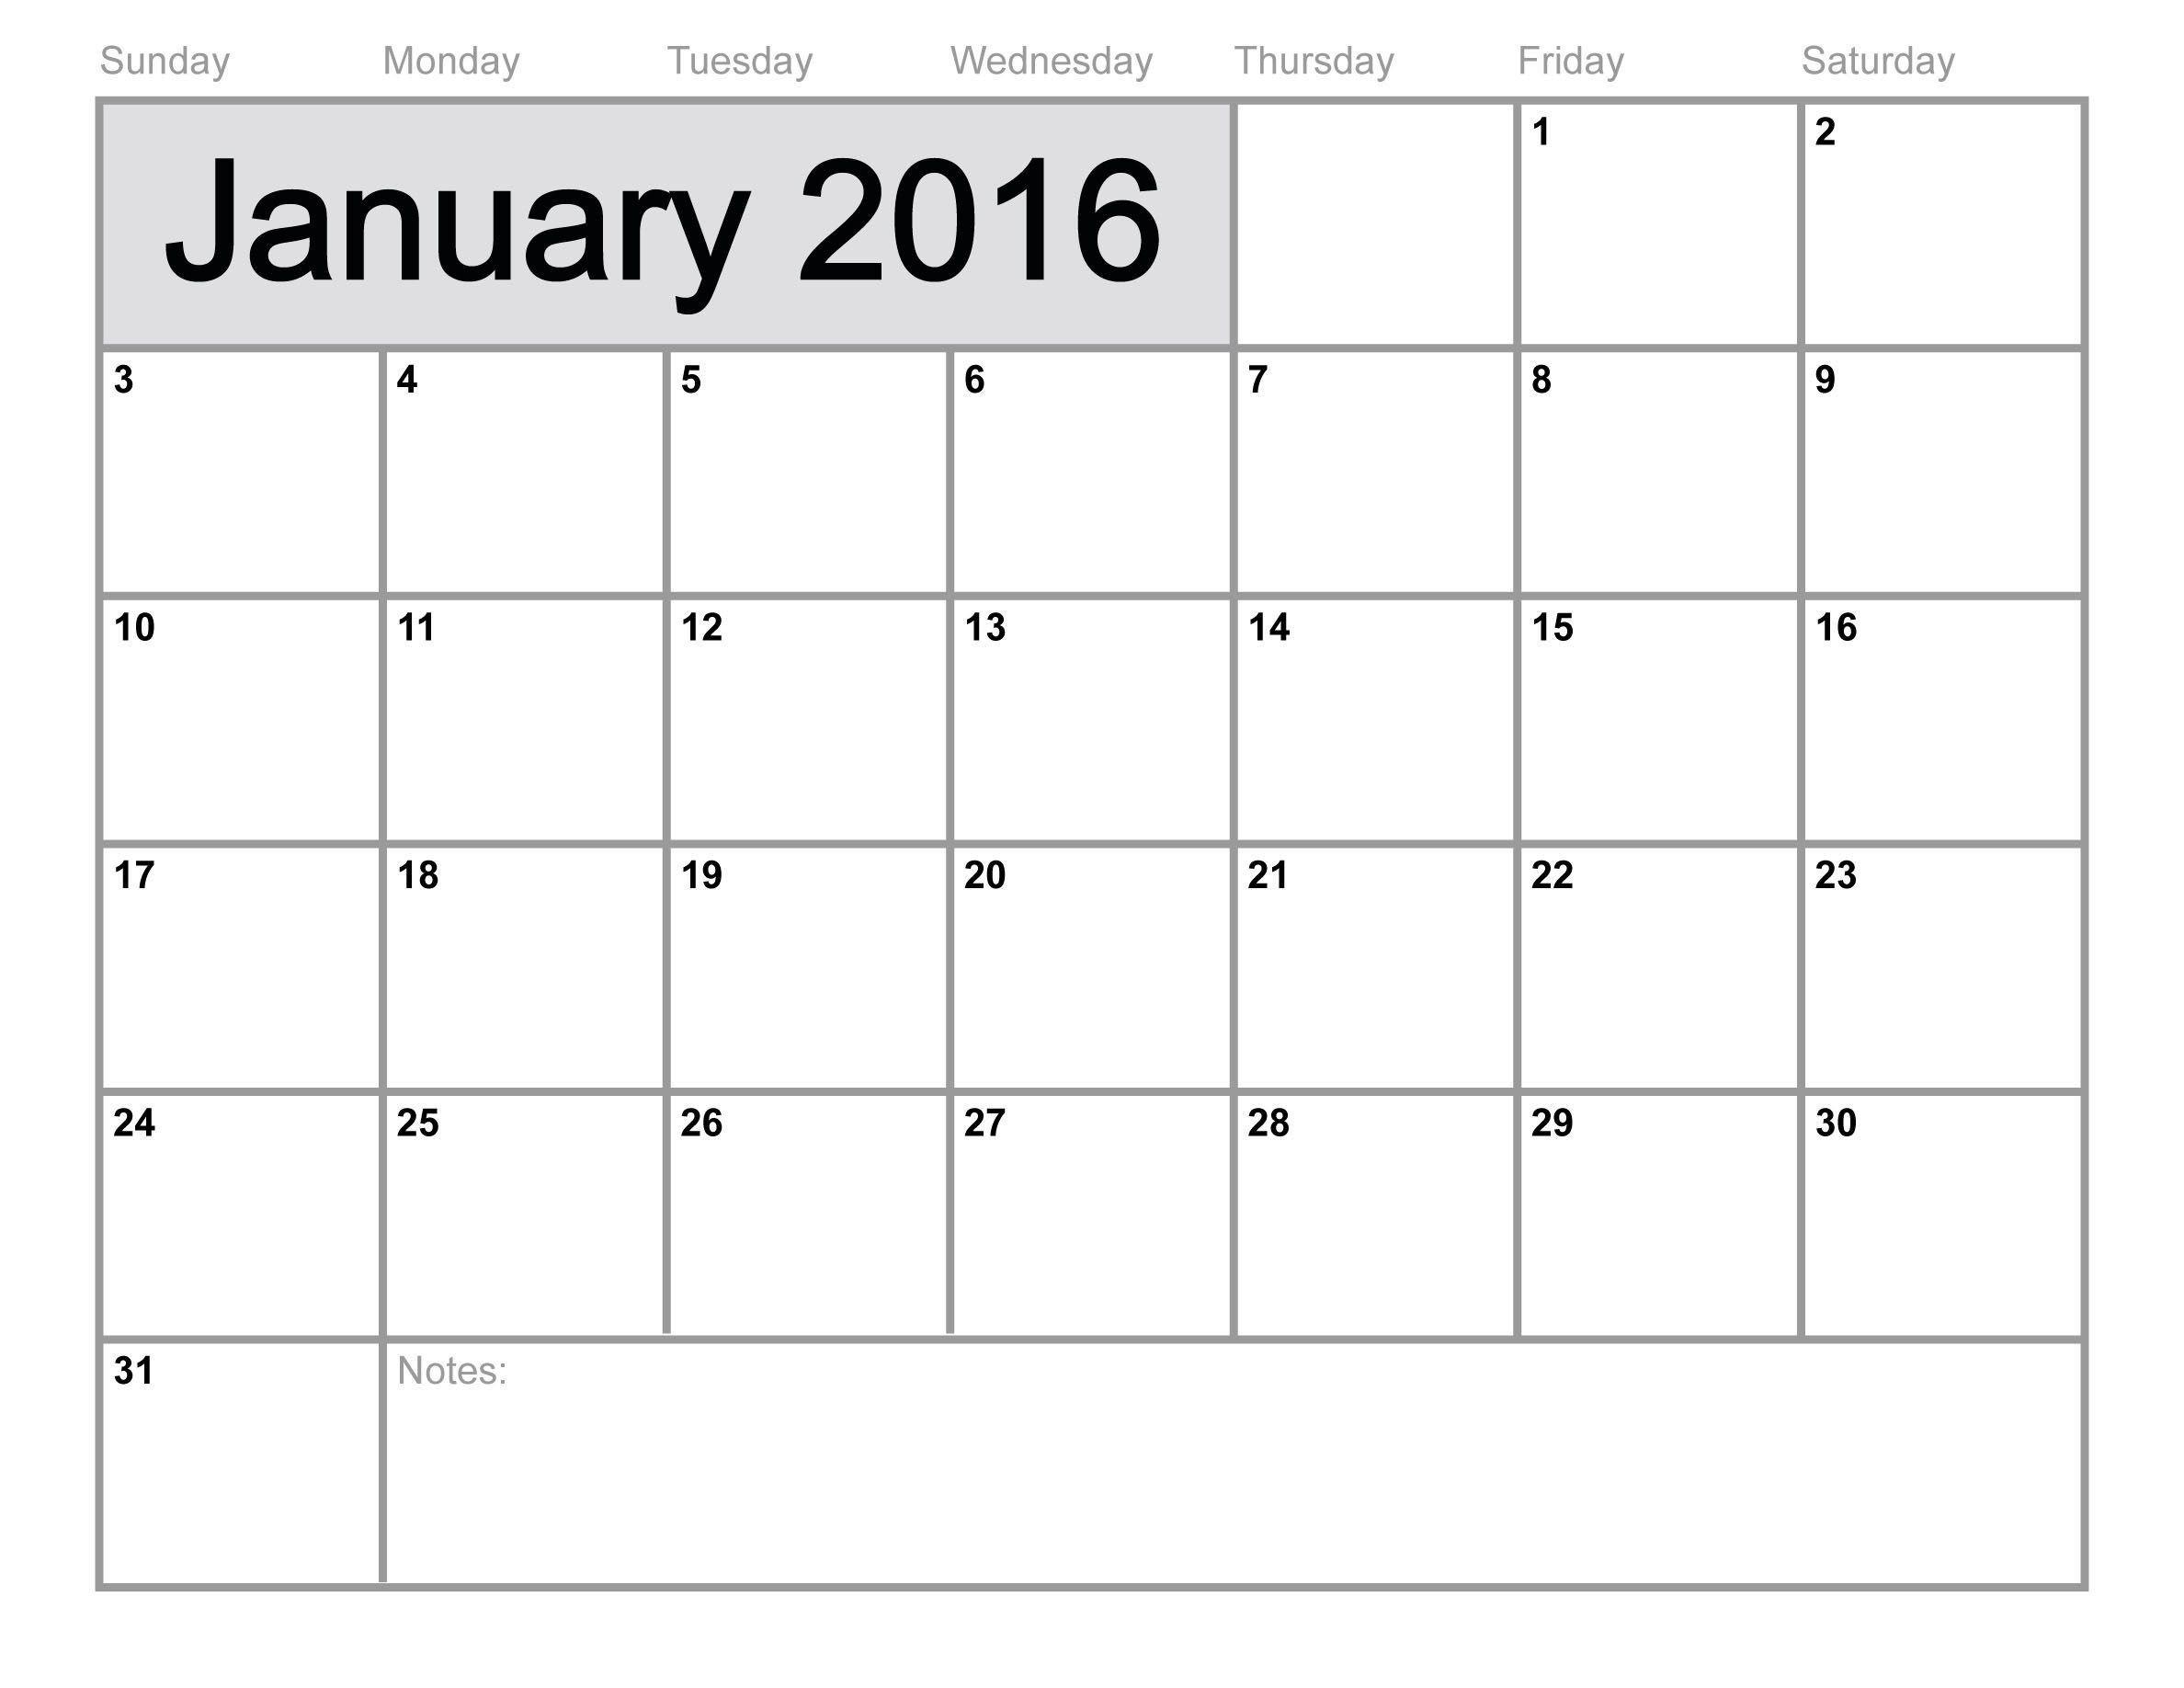 2015 Blank Calendar Uk Printable For No Cost - Calendaro-Monthly Calendar Uk Printable